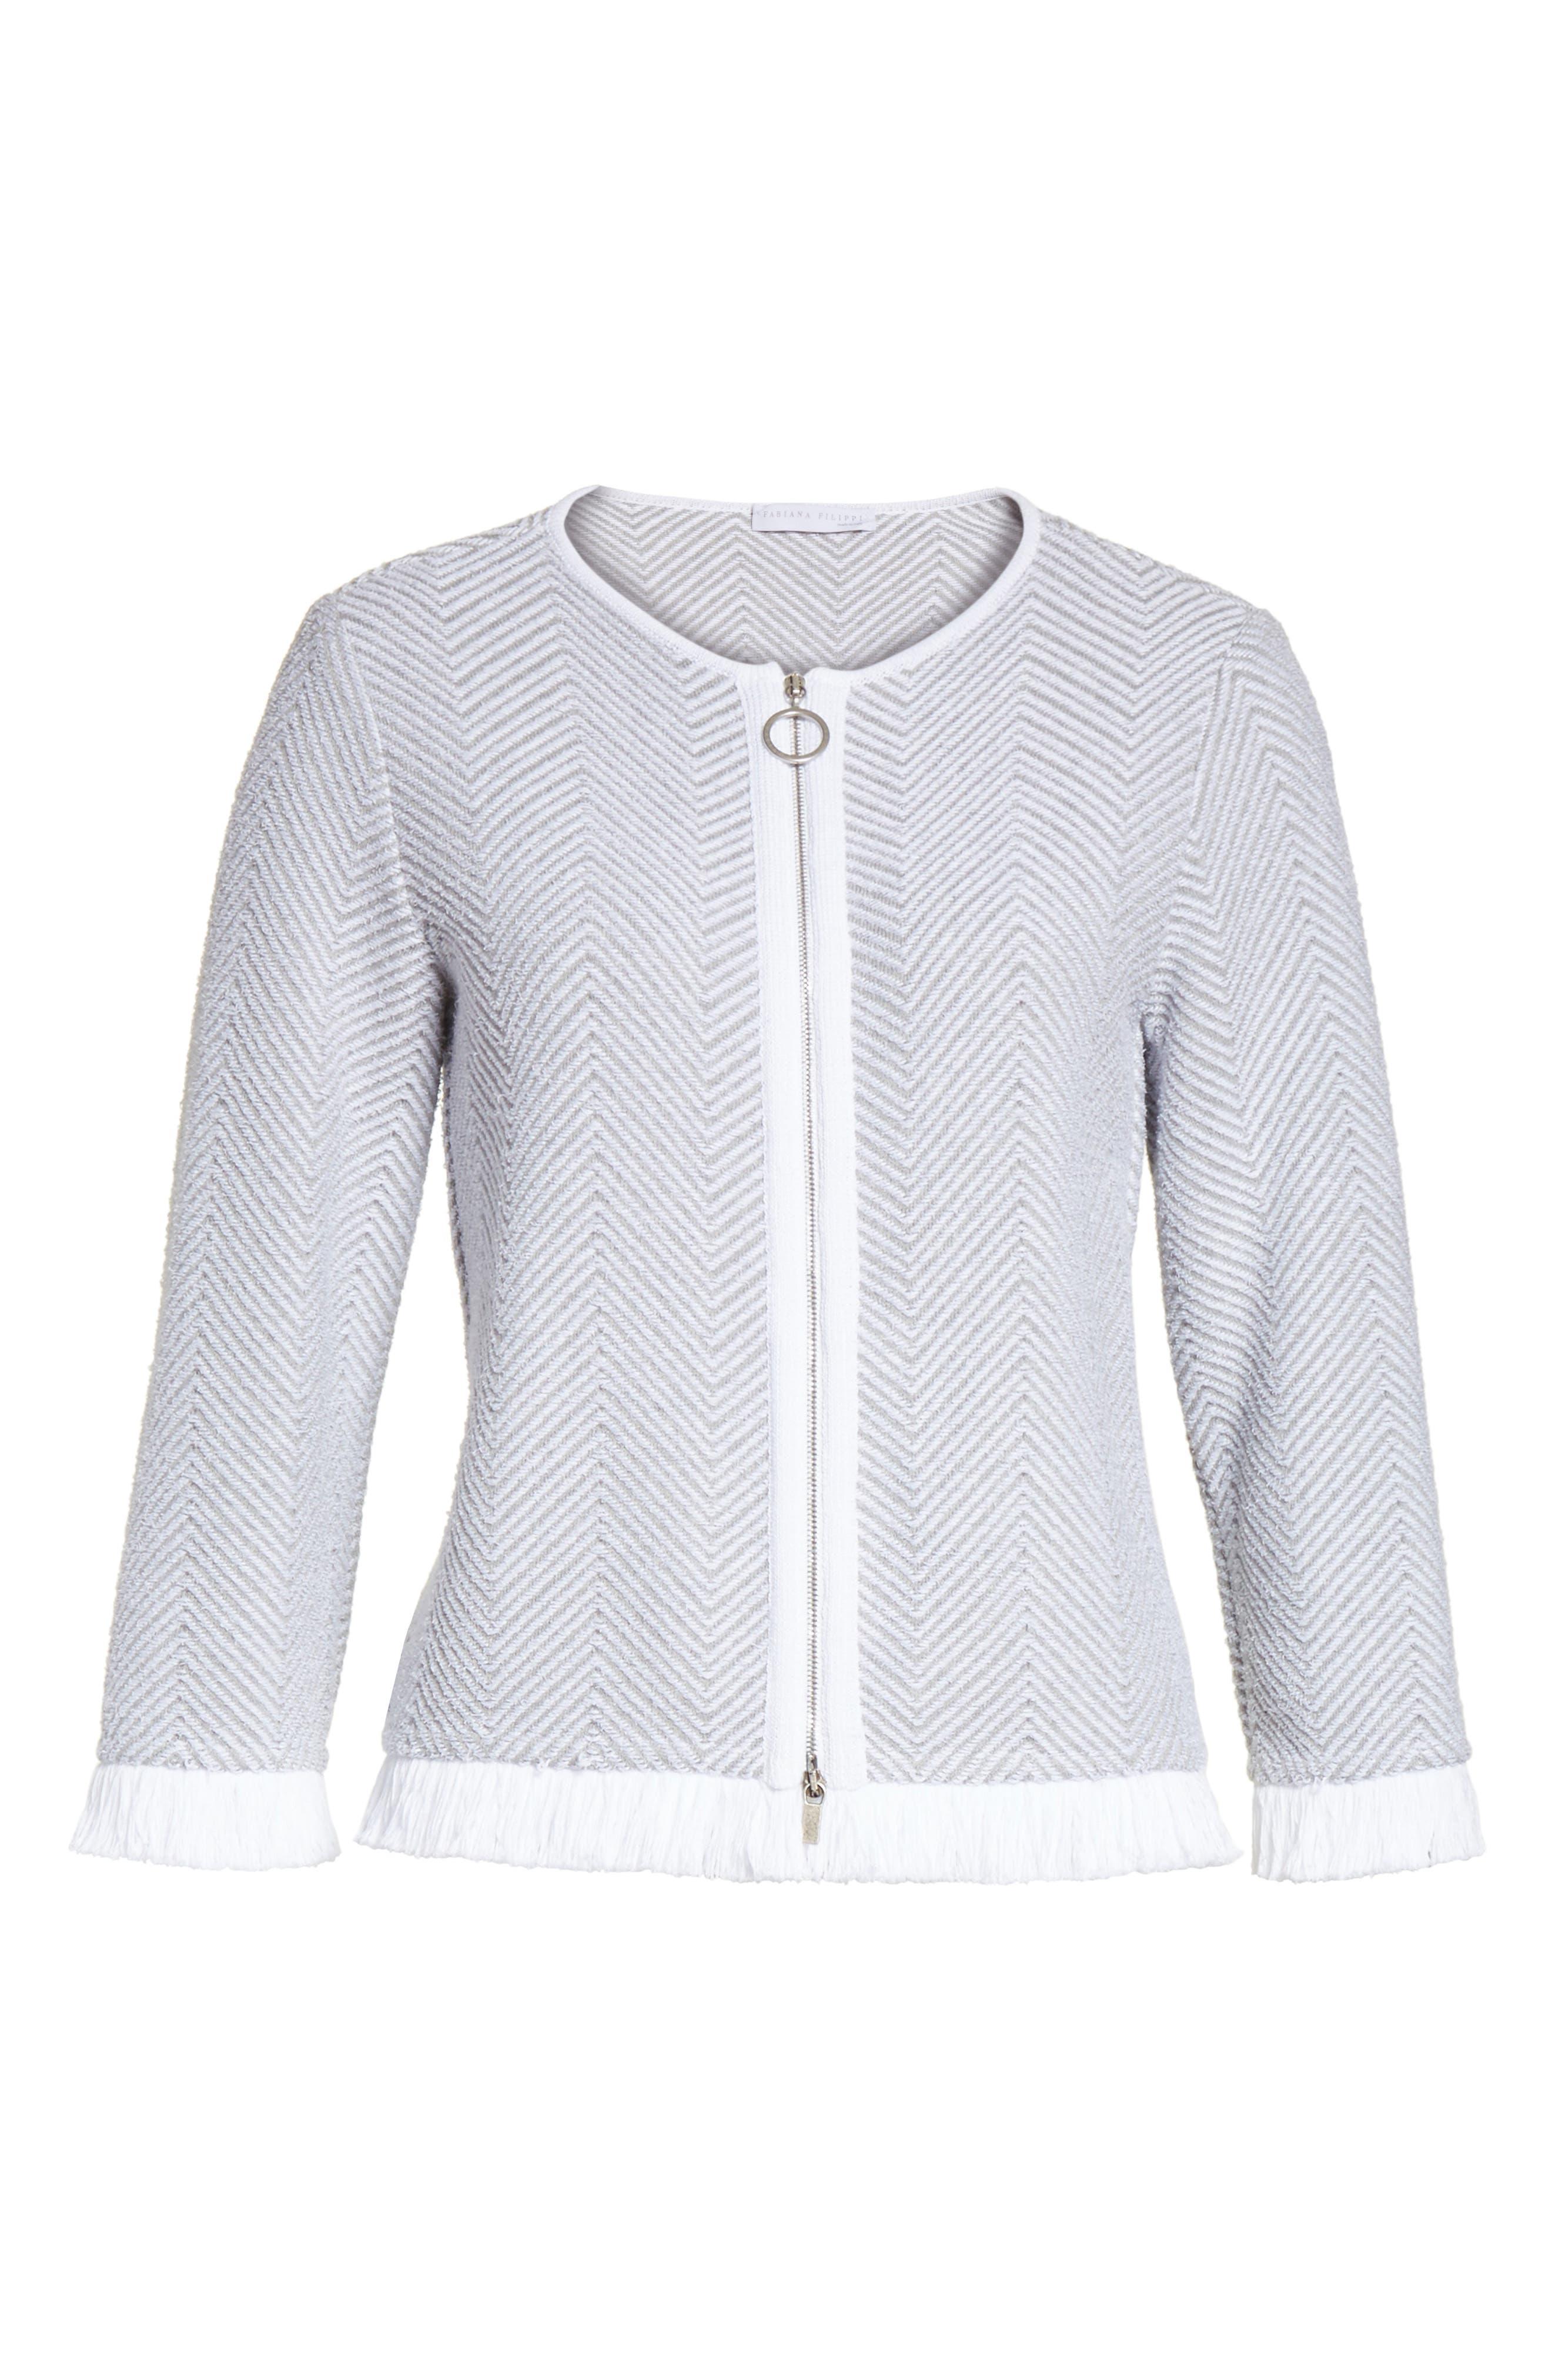 Chevron Knit Jacket,                             Alternate thumbnail 5, color,                             050